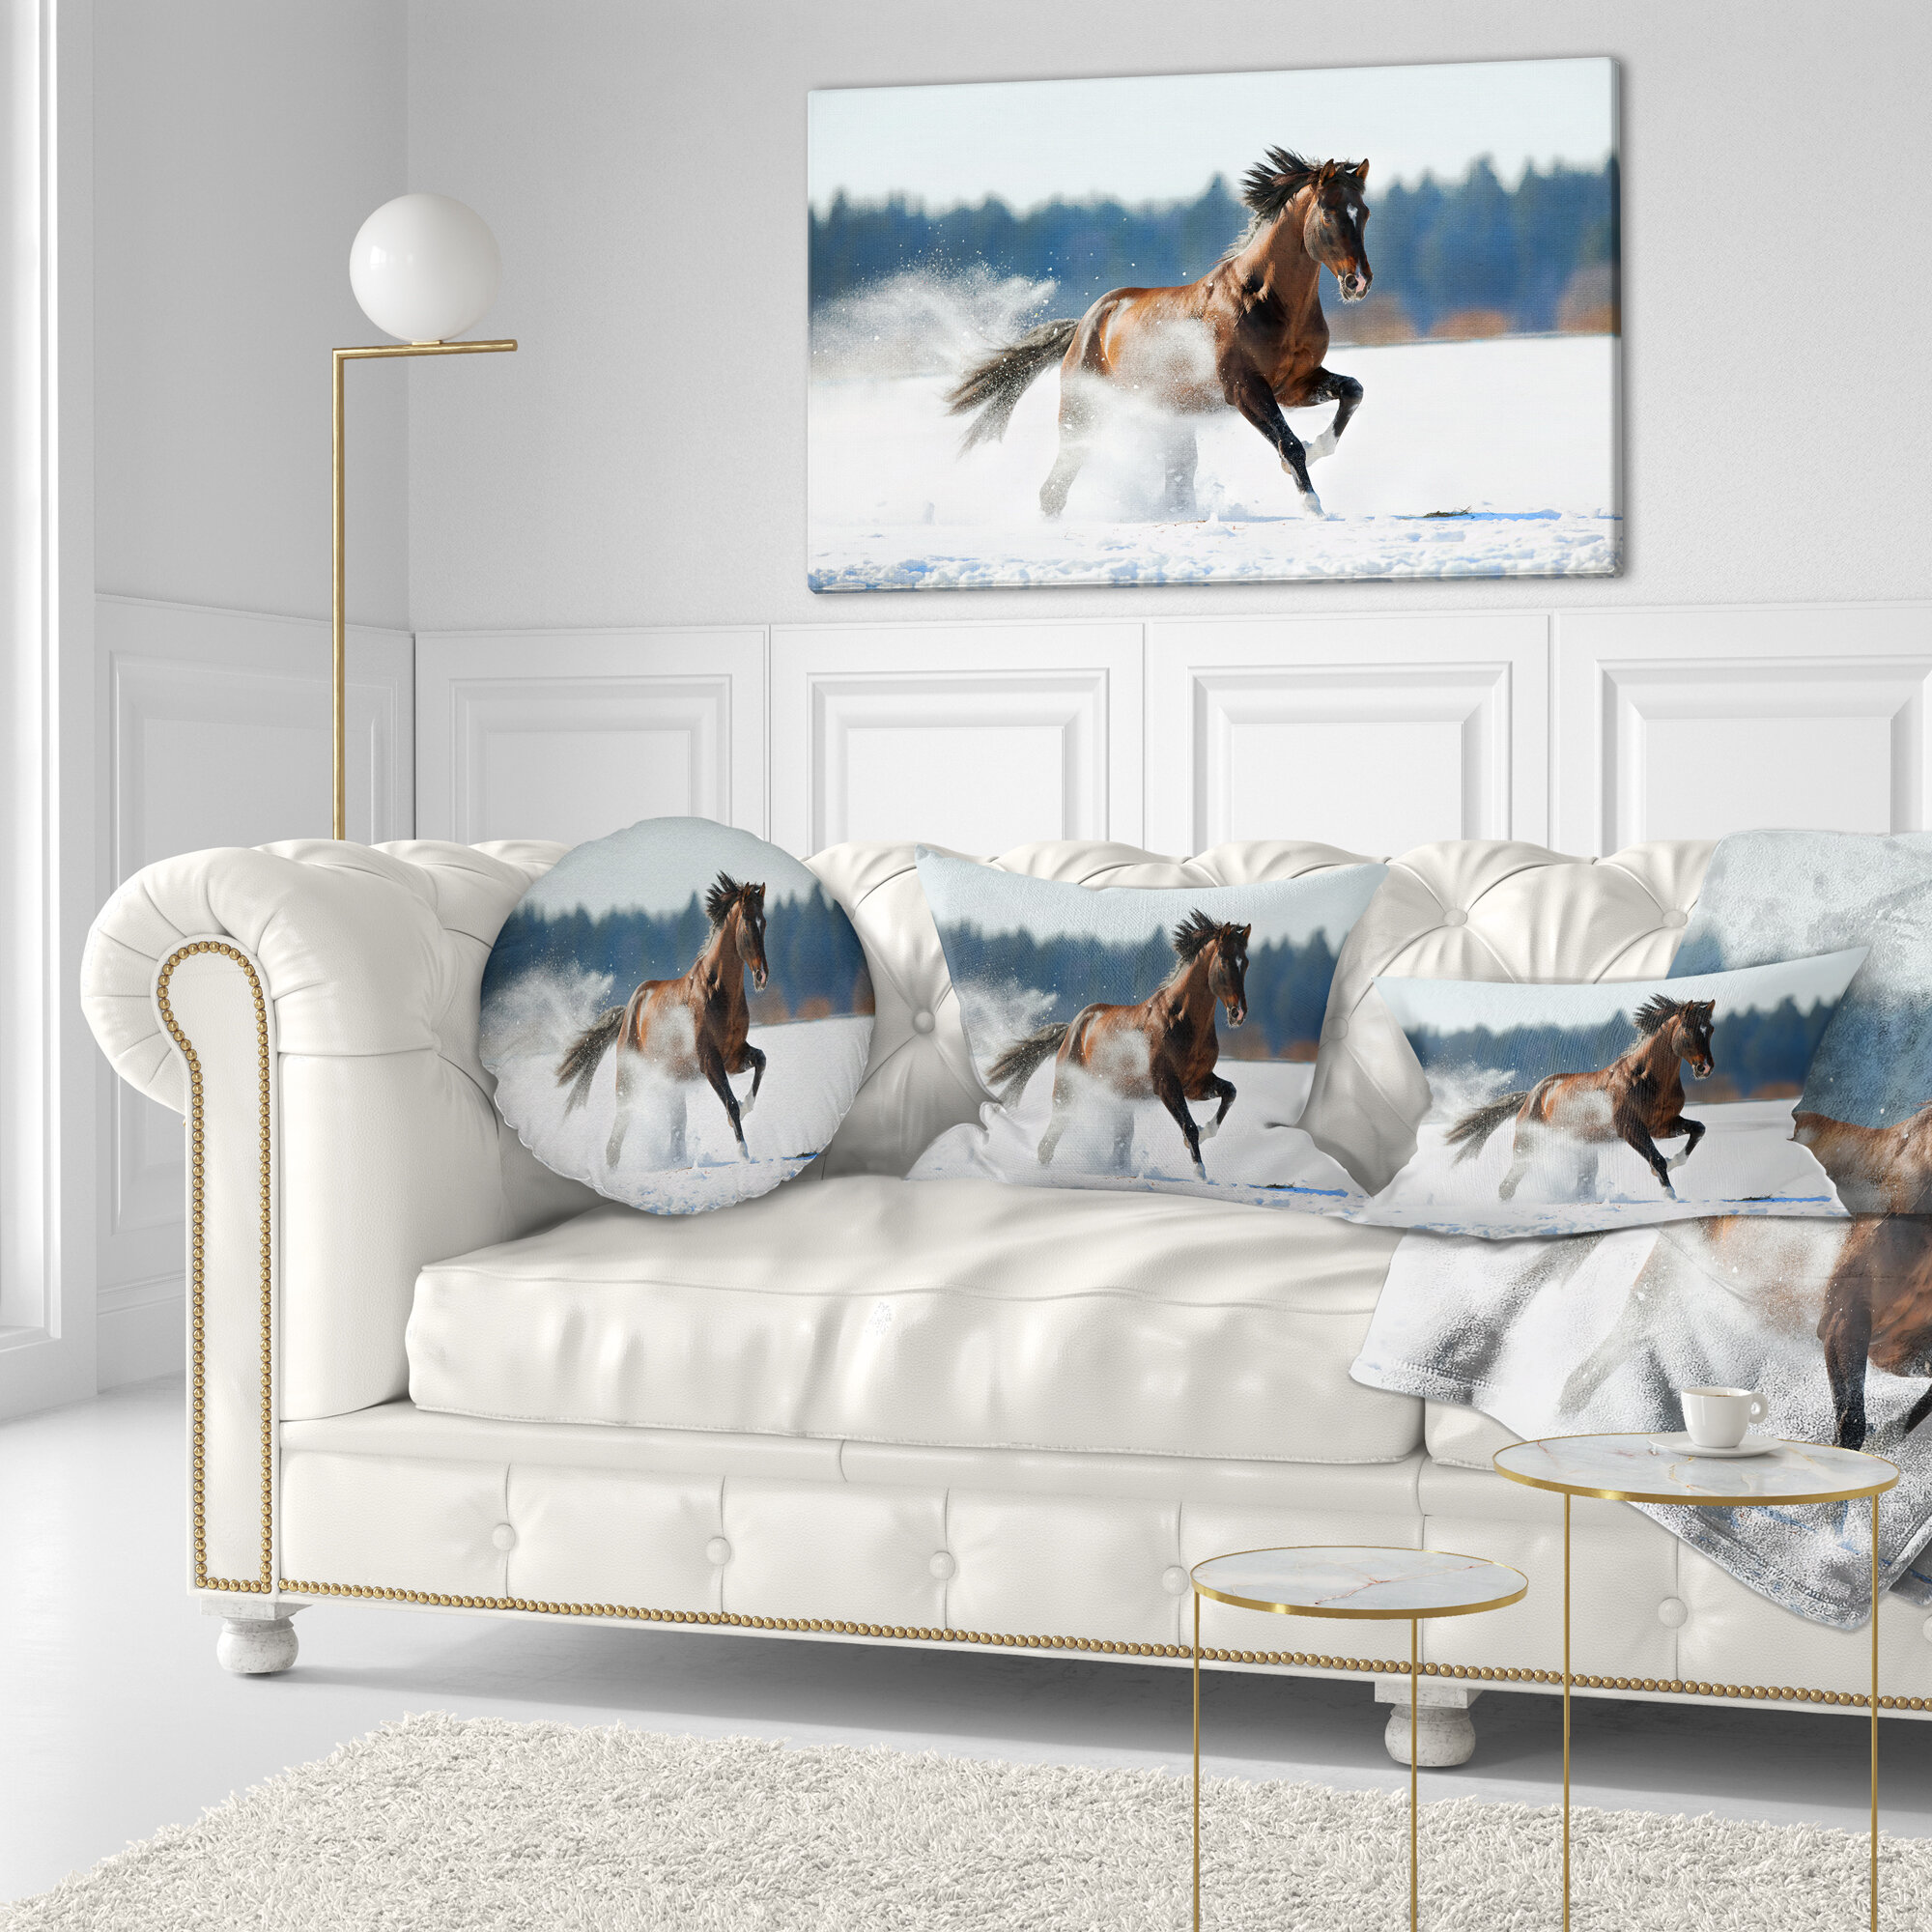 East Urban Home Designart Horse Running In Winter Landscape Photography